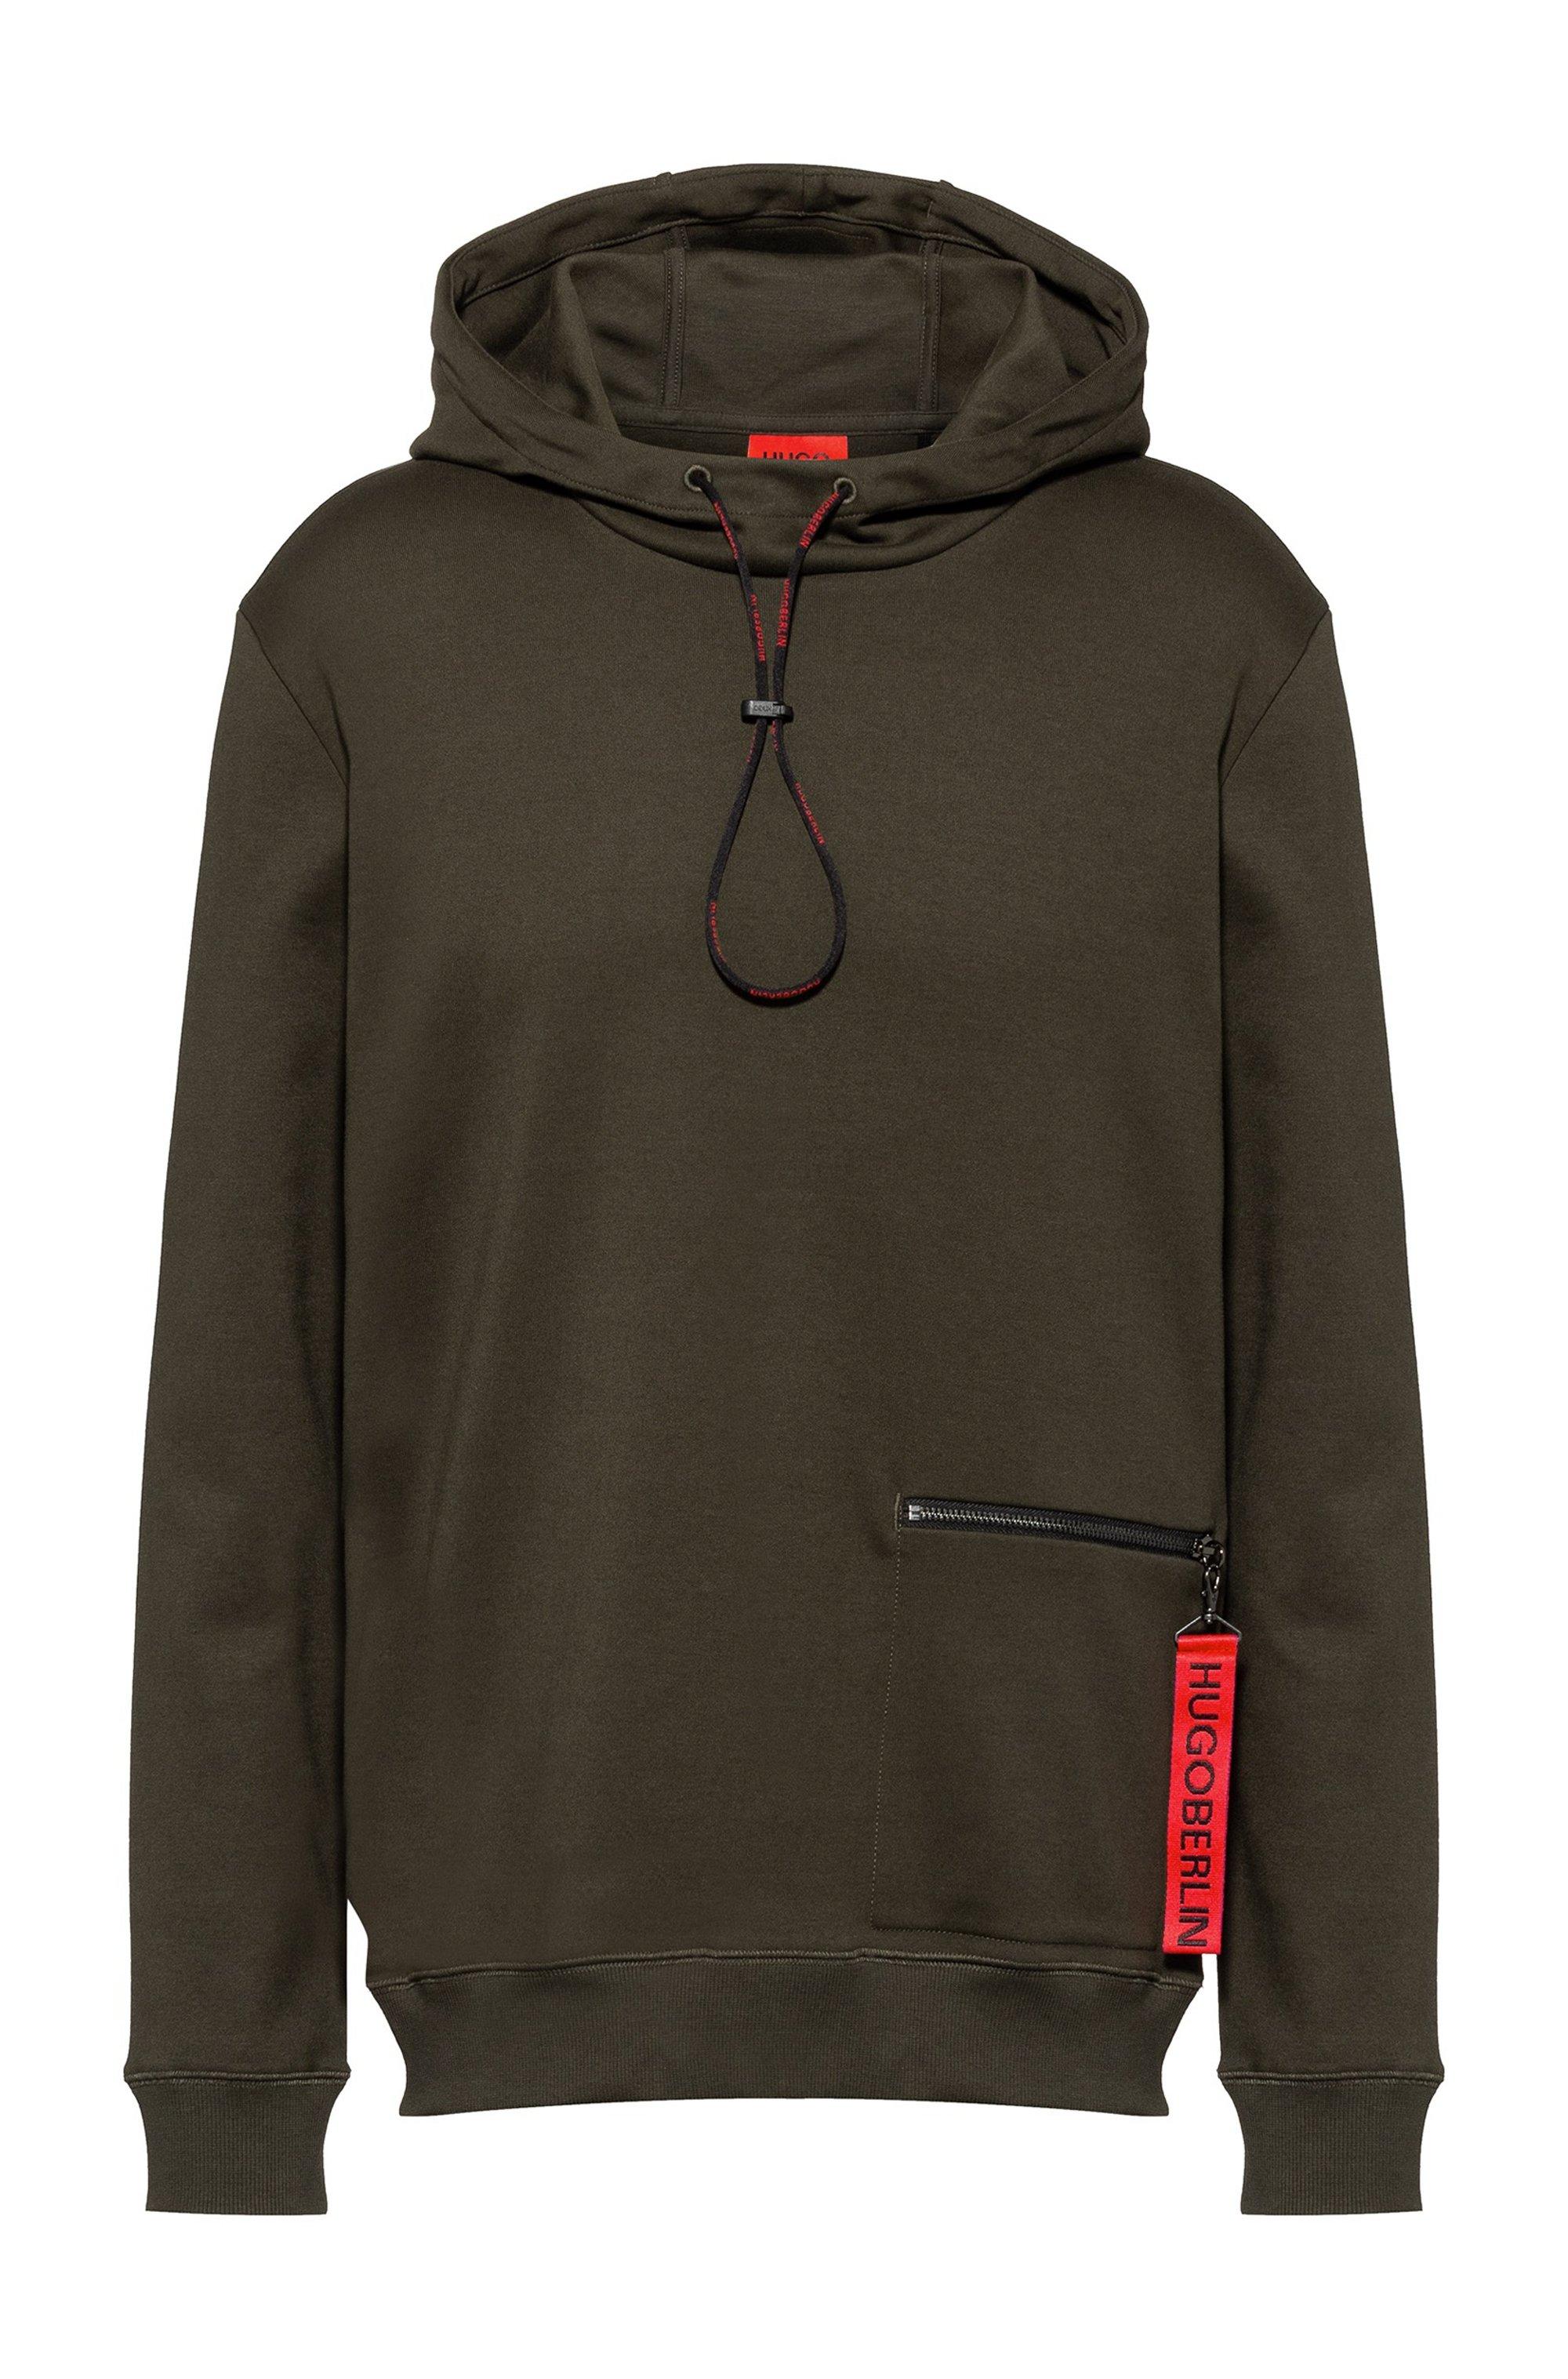 Interlock-cotton hooded sweatshirt with zipped pocket, Khaki